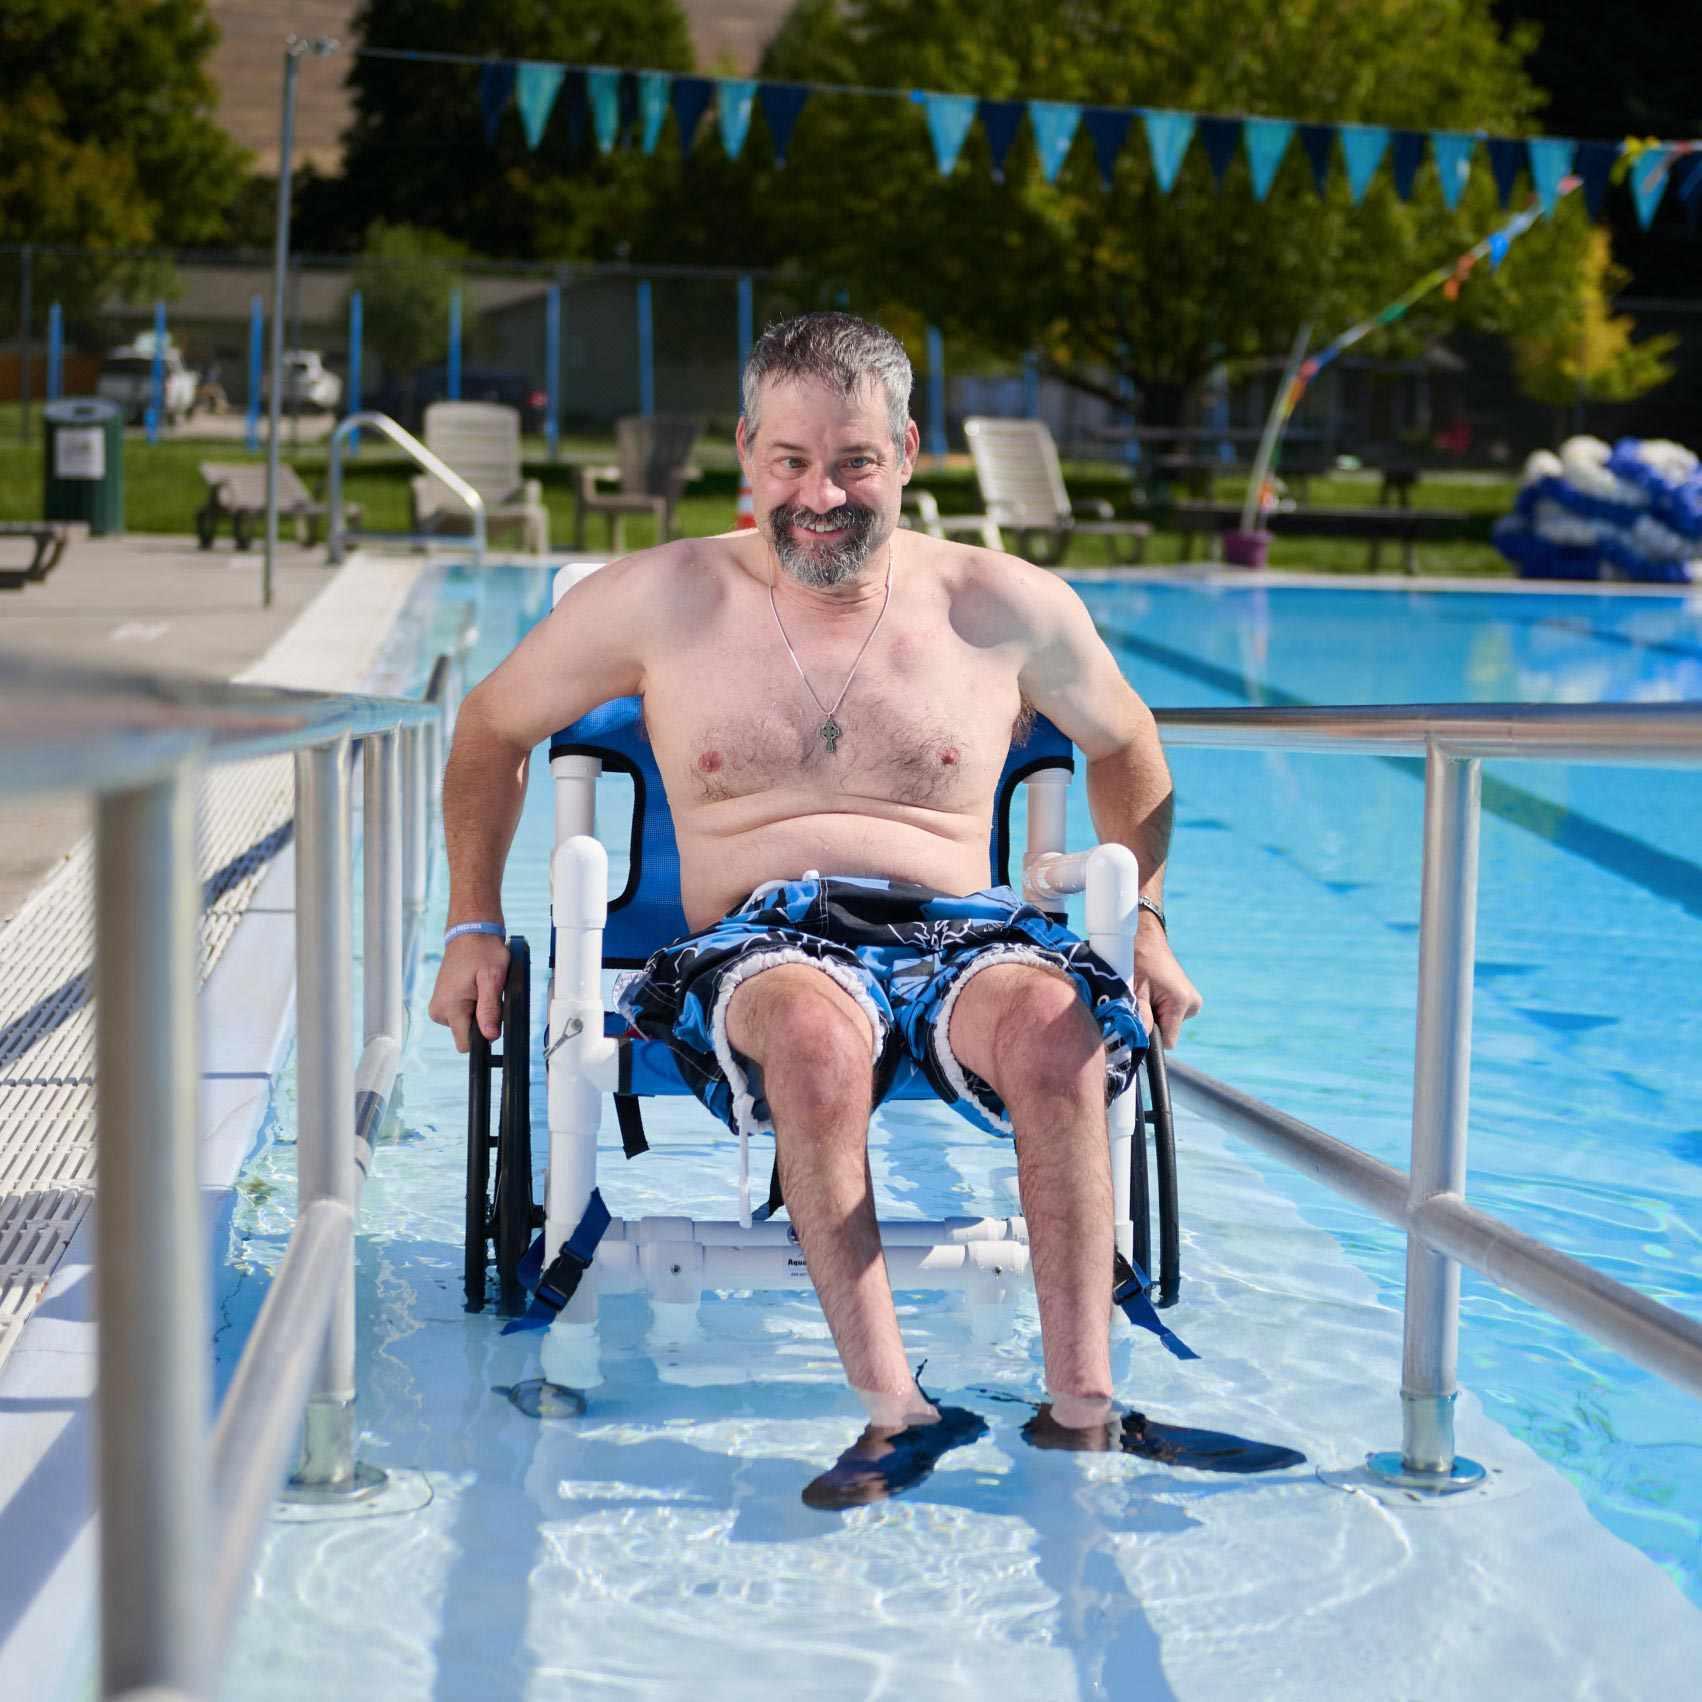 Aqua creek heavy duty pool chair with mesh seat